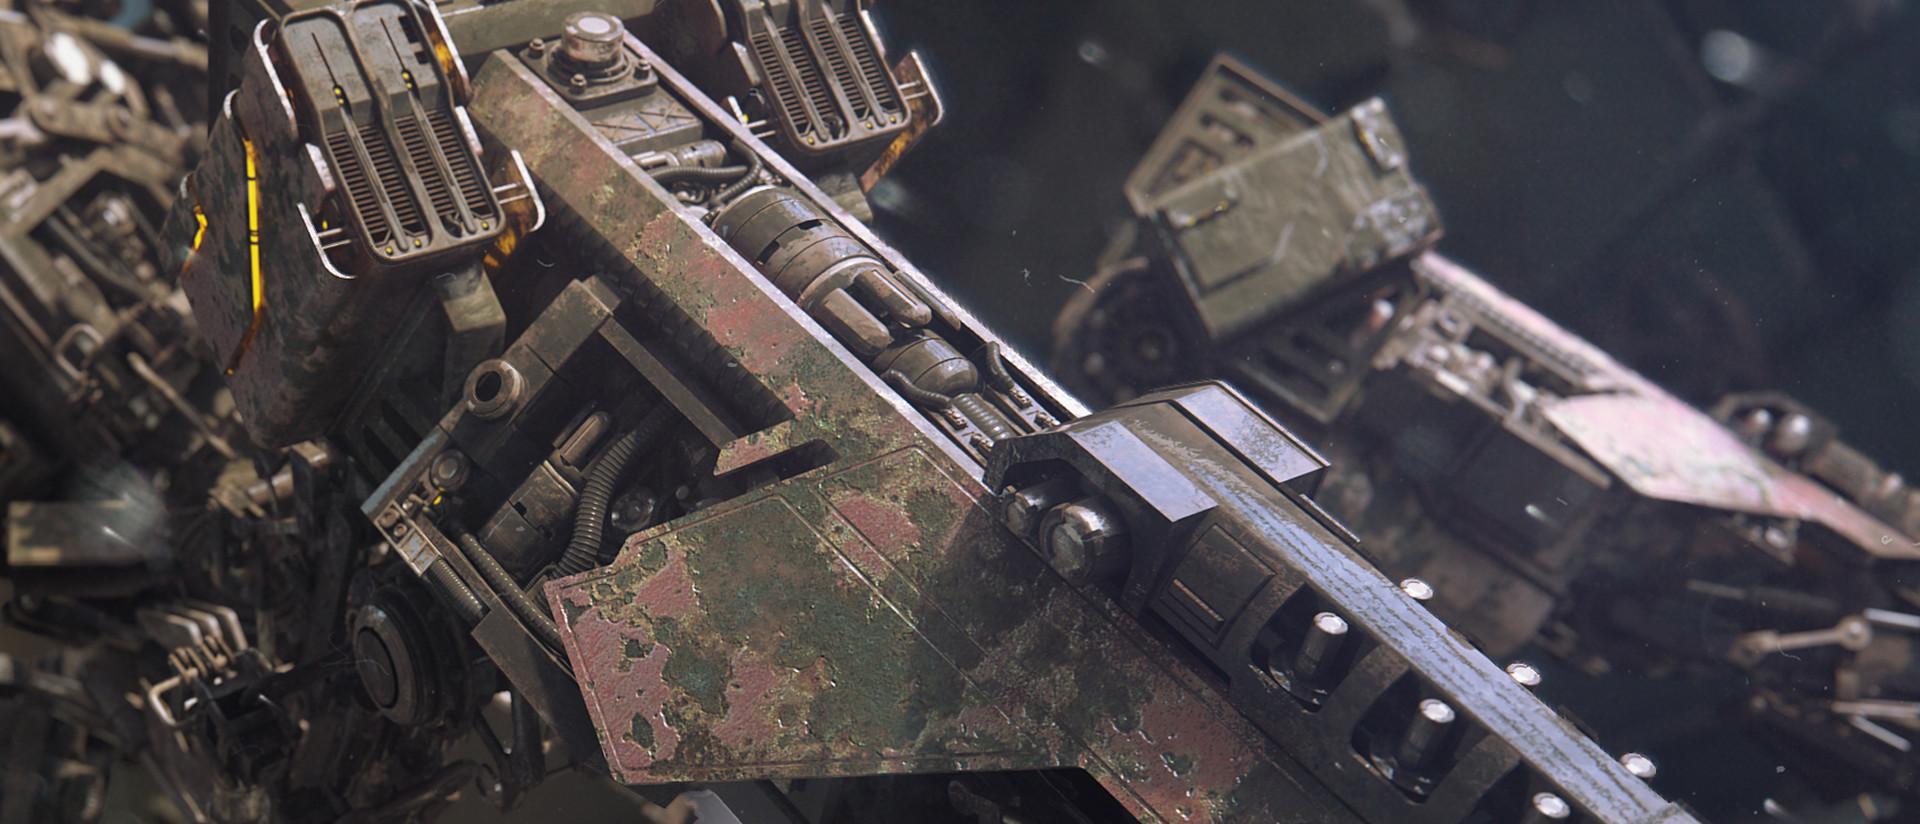 Andrew averkin industrial rust close up 1